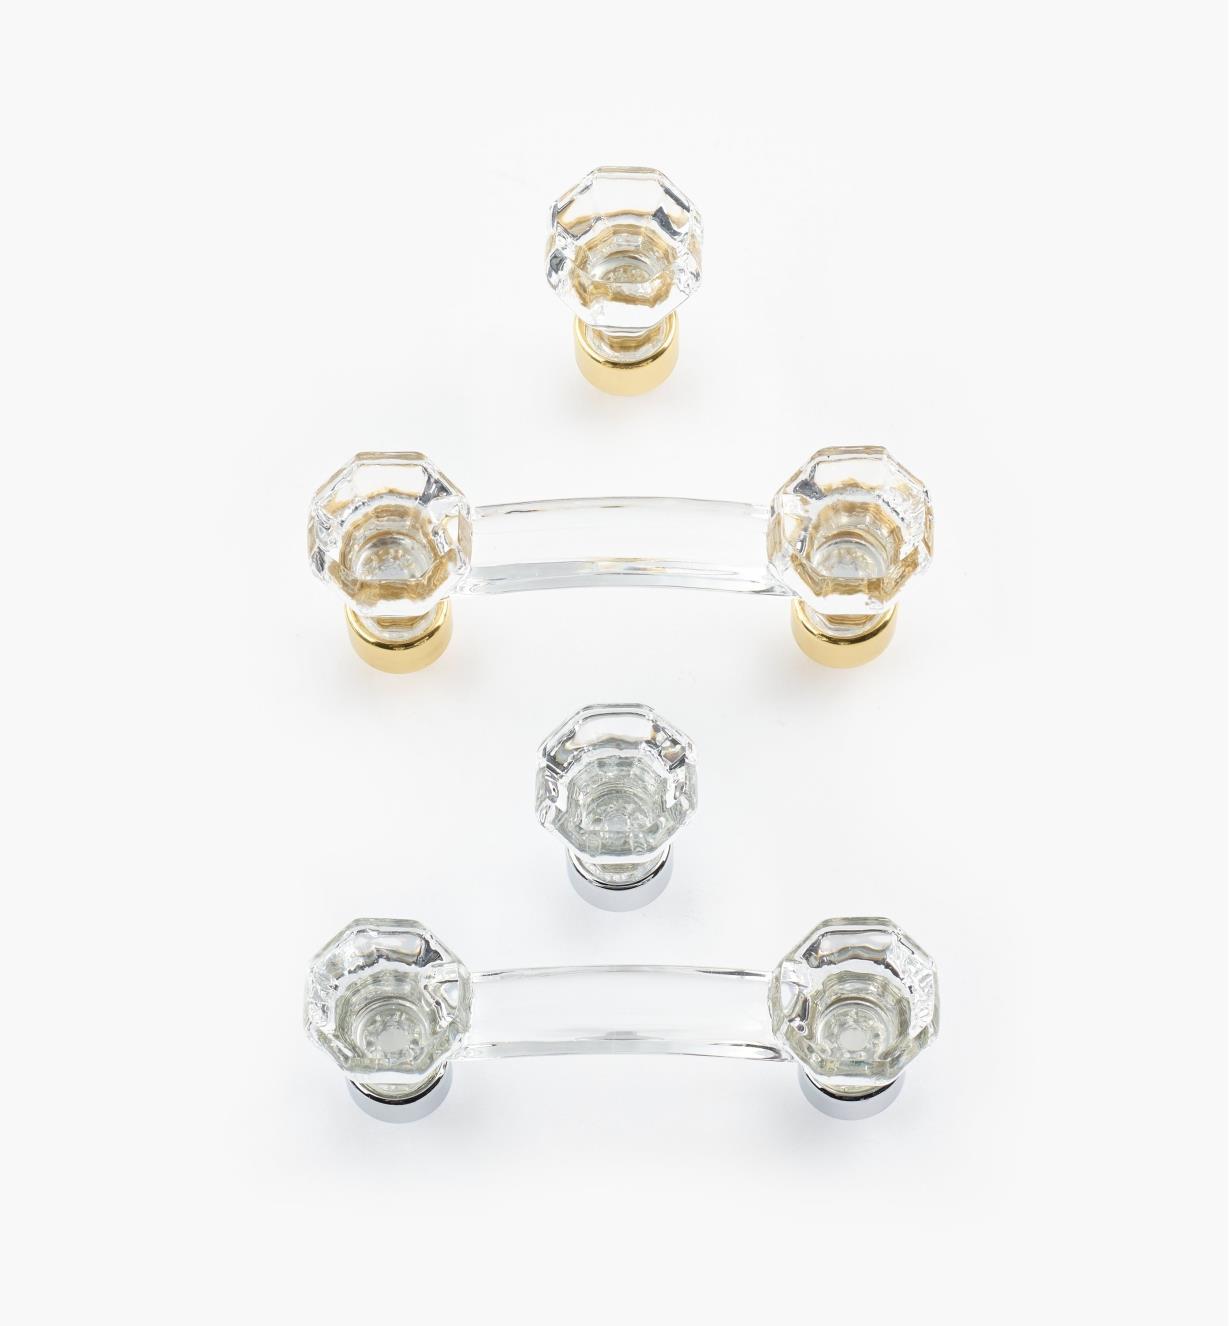 Octagonal Crystal Hardware